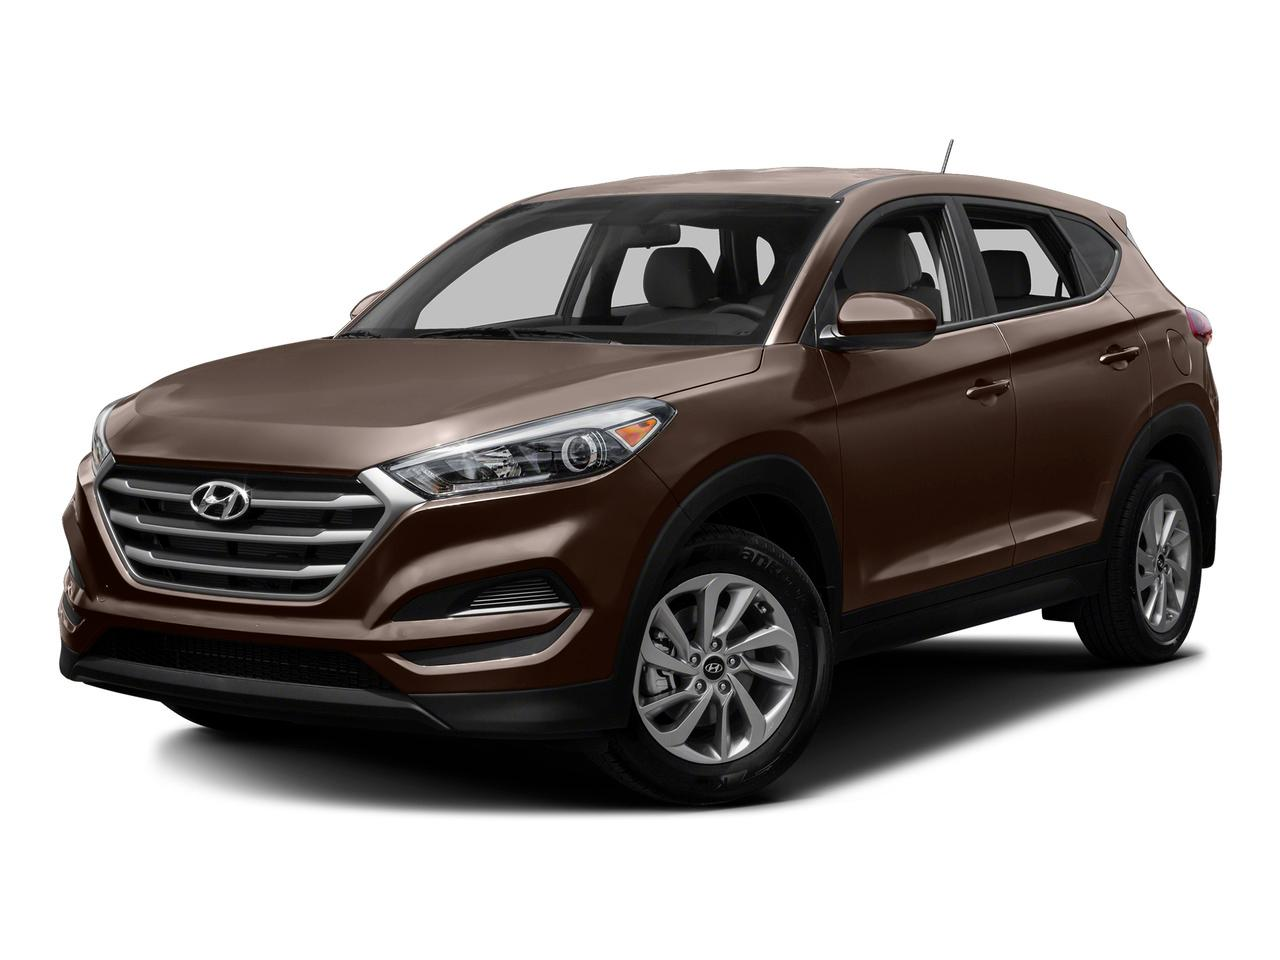 2016 Hyundai Tucson Vehicle Photo in Odessa, TX 79762